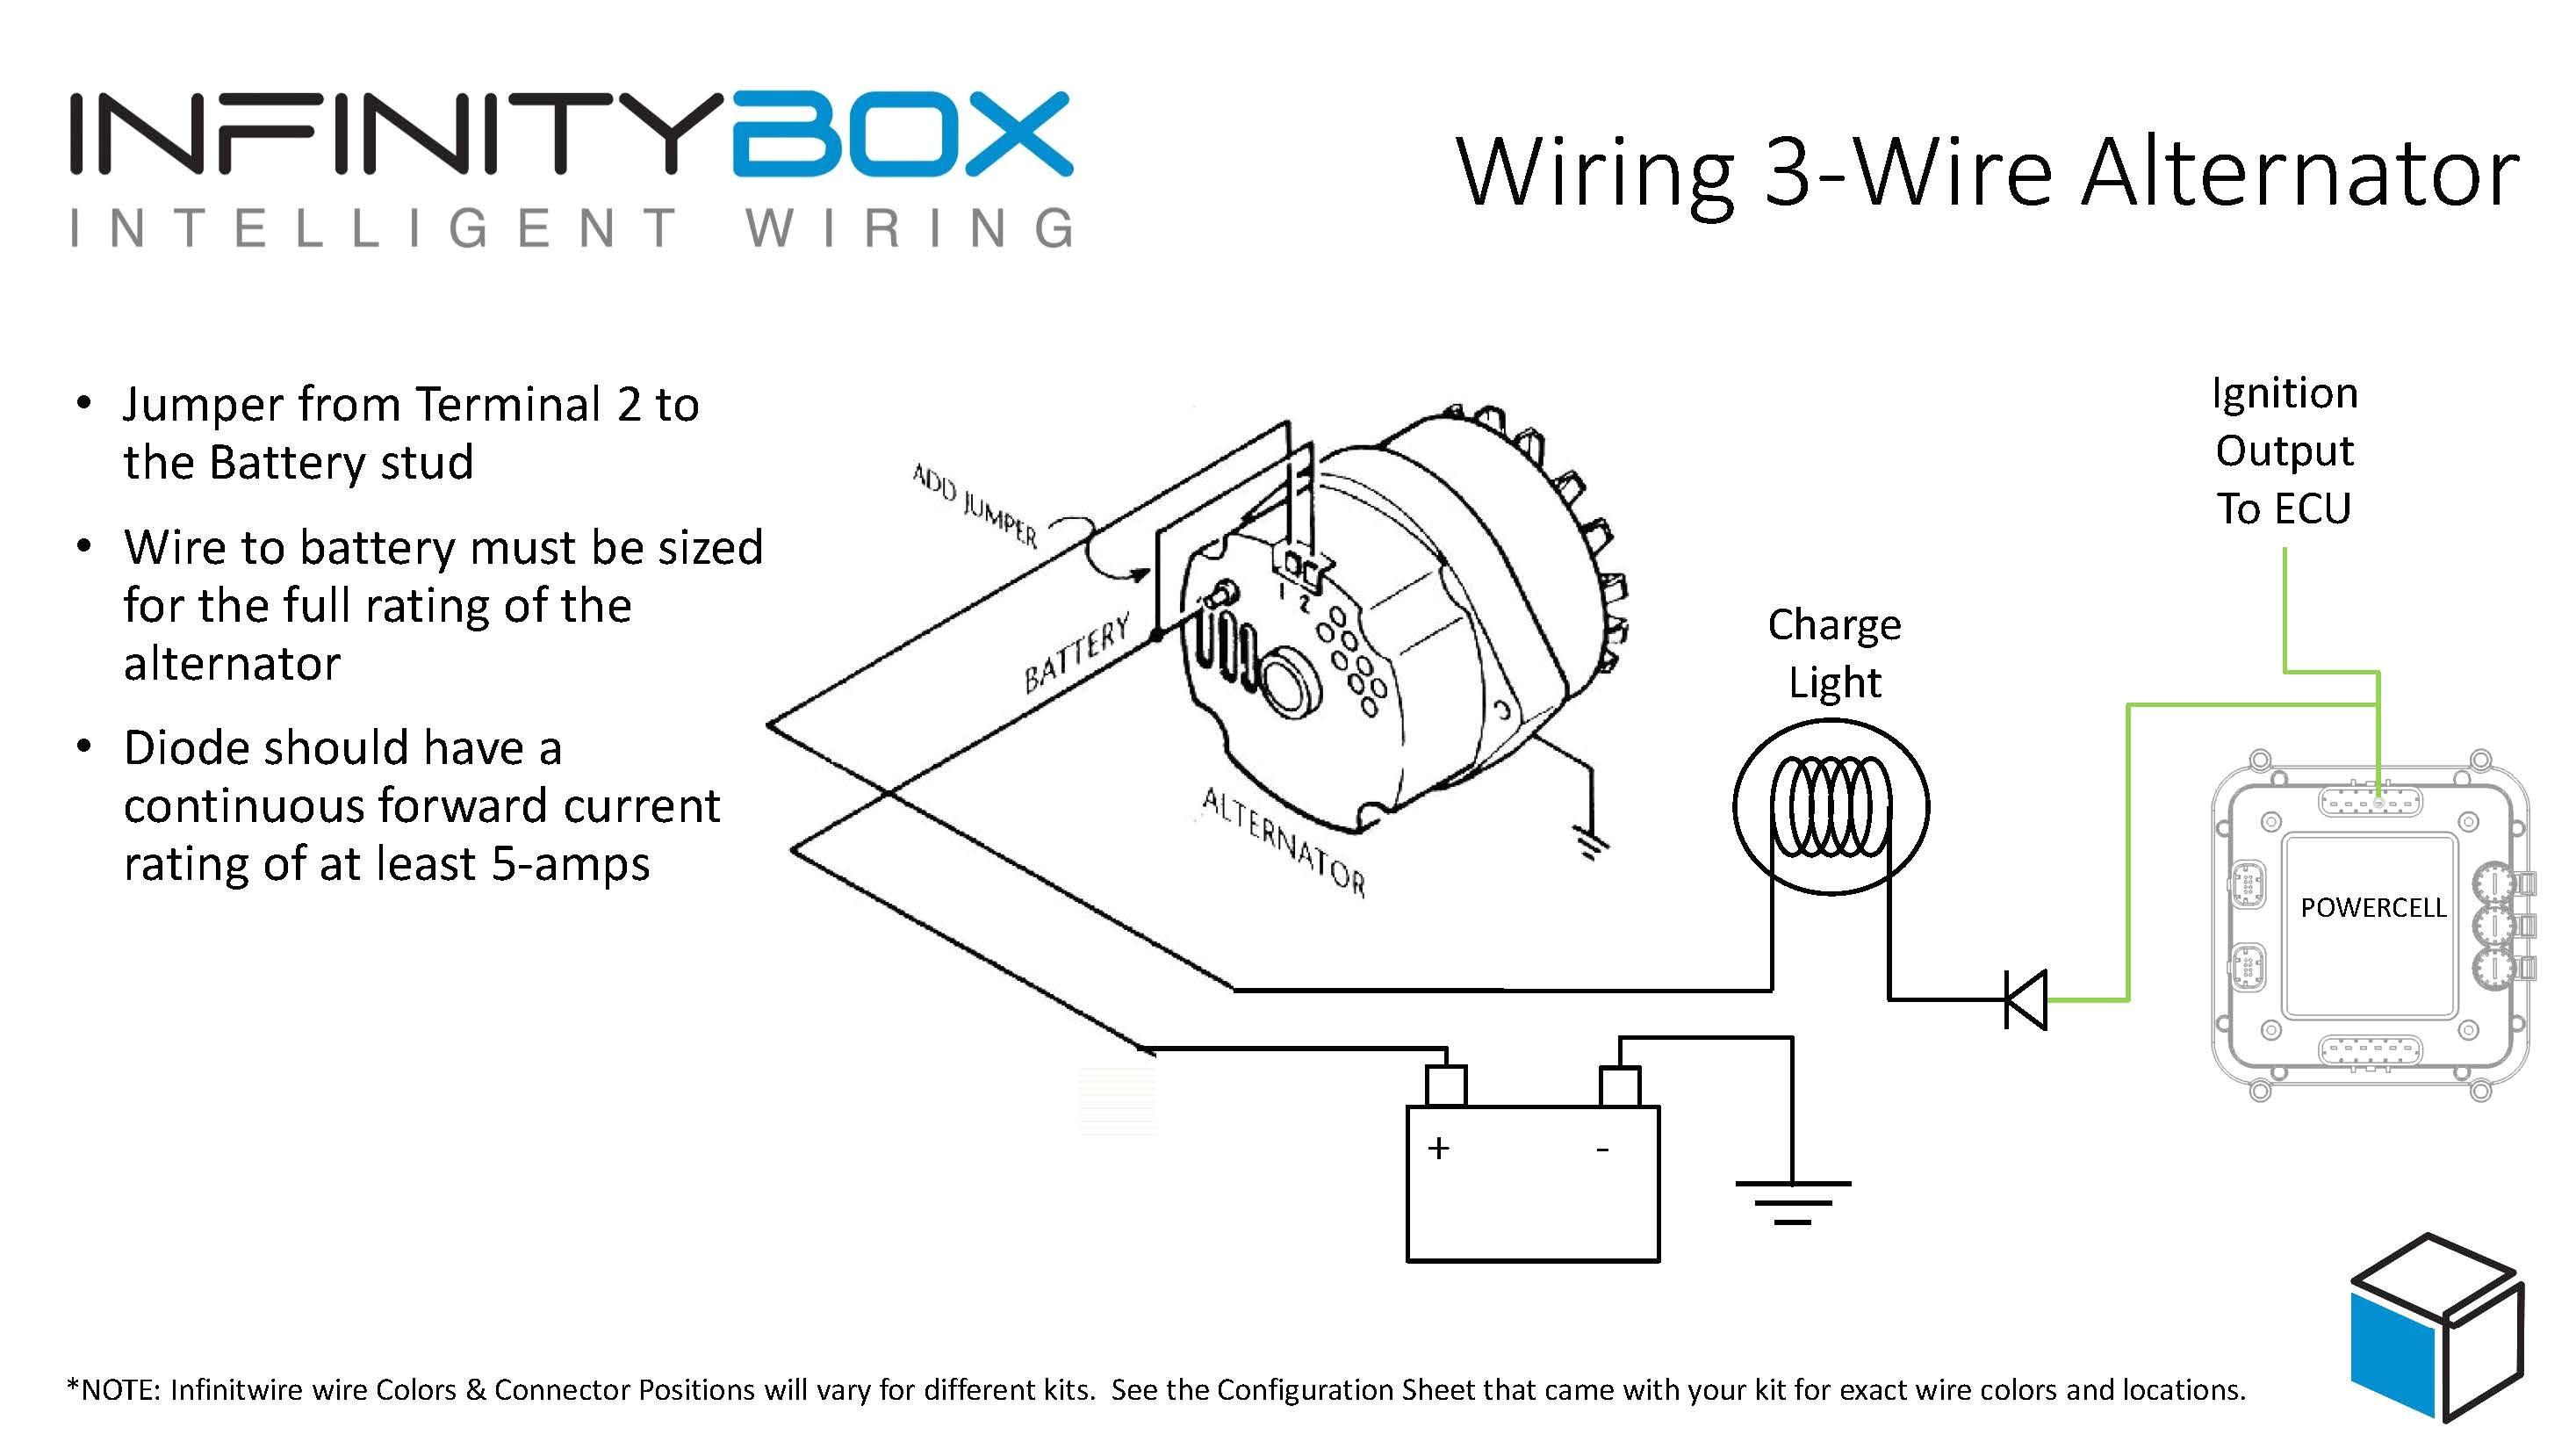 8 liter gm alternator wiring wiring diagram expert 3 4l gm alternator wiring